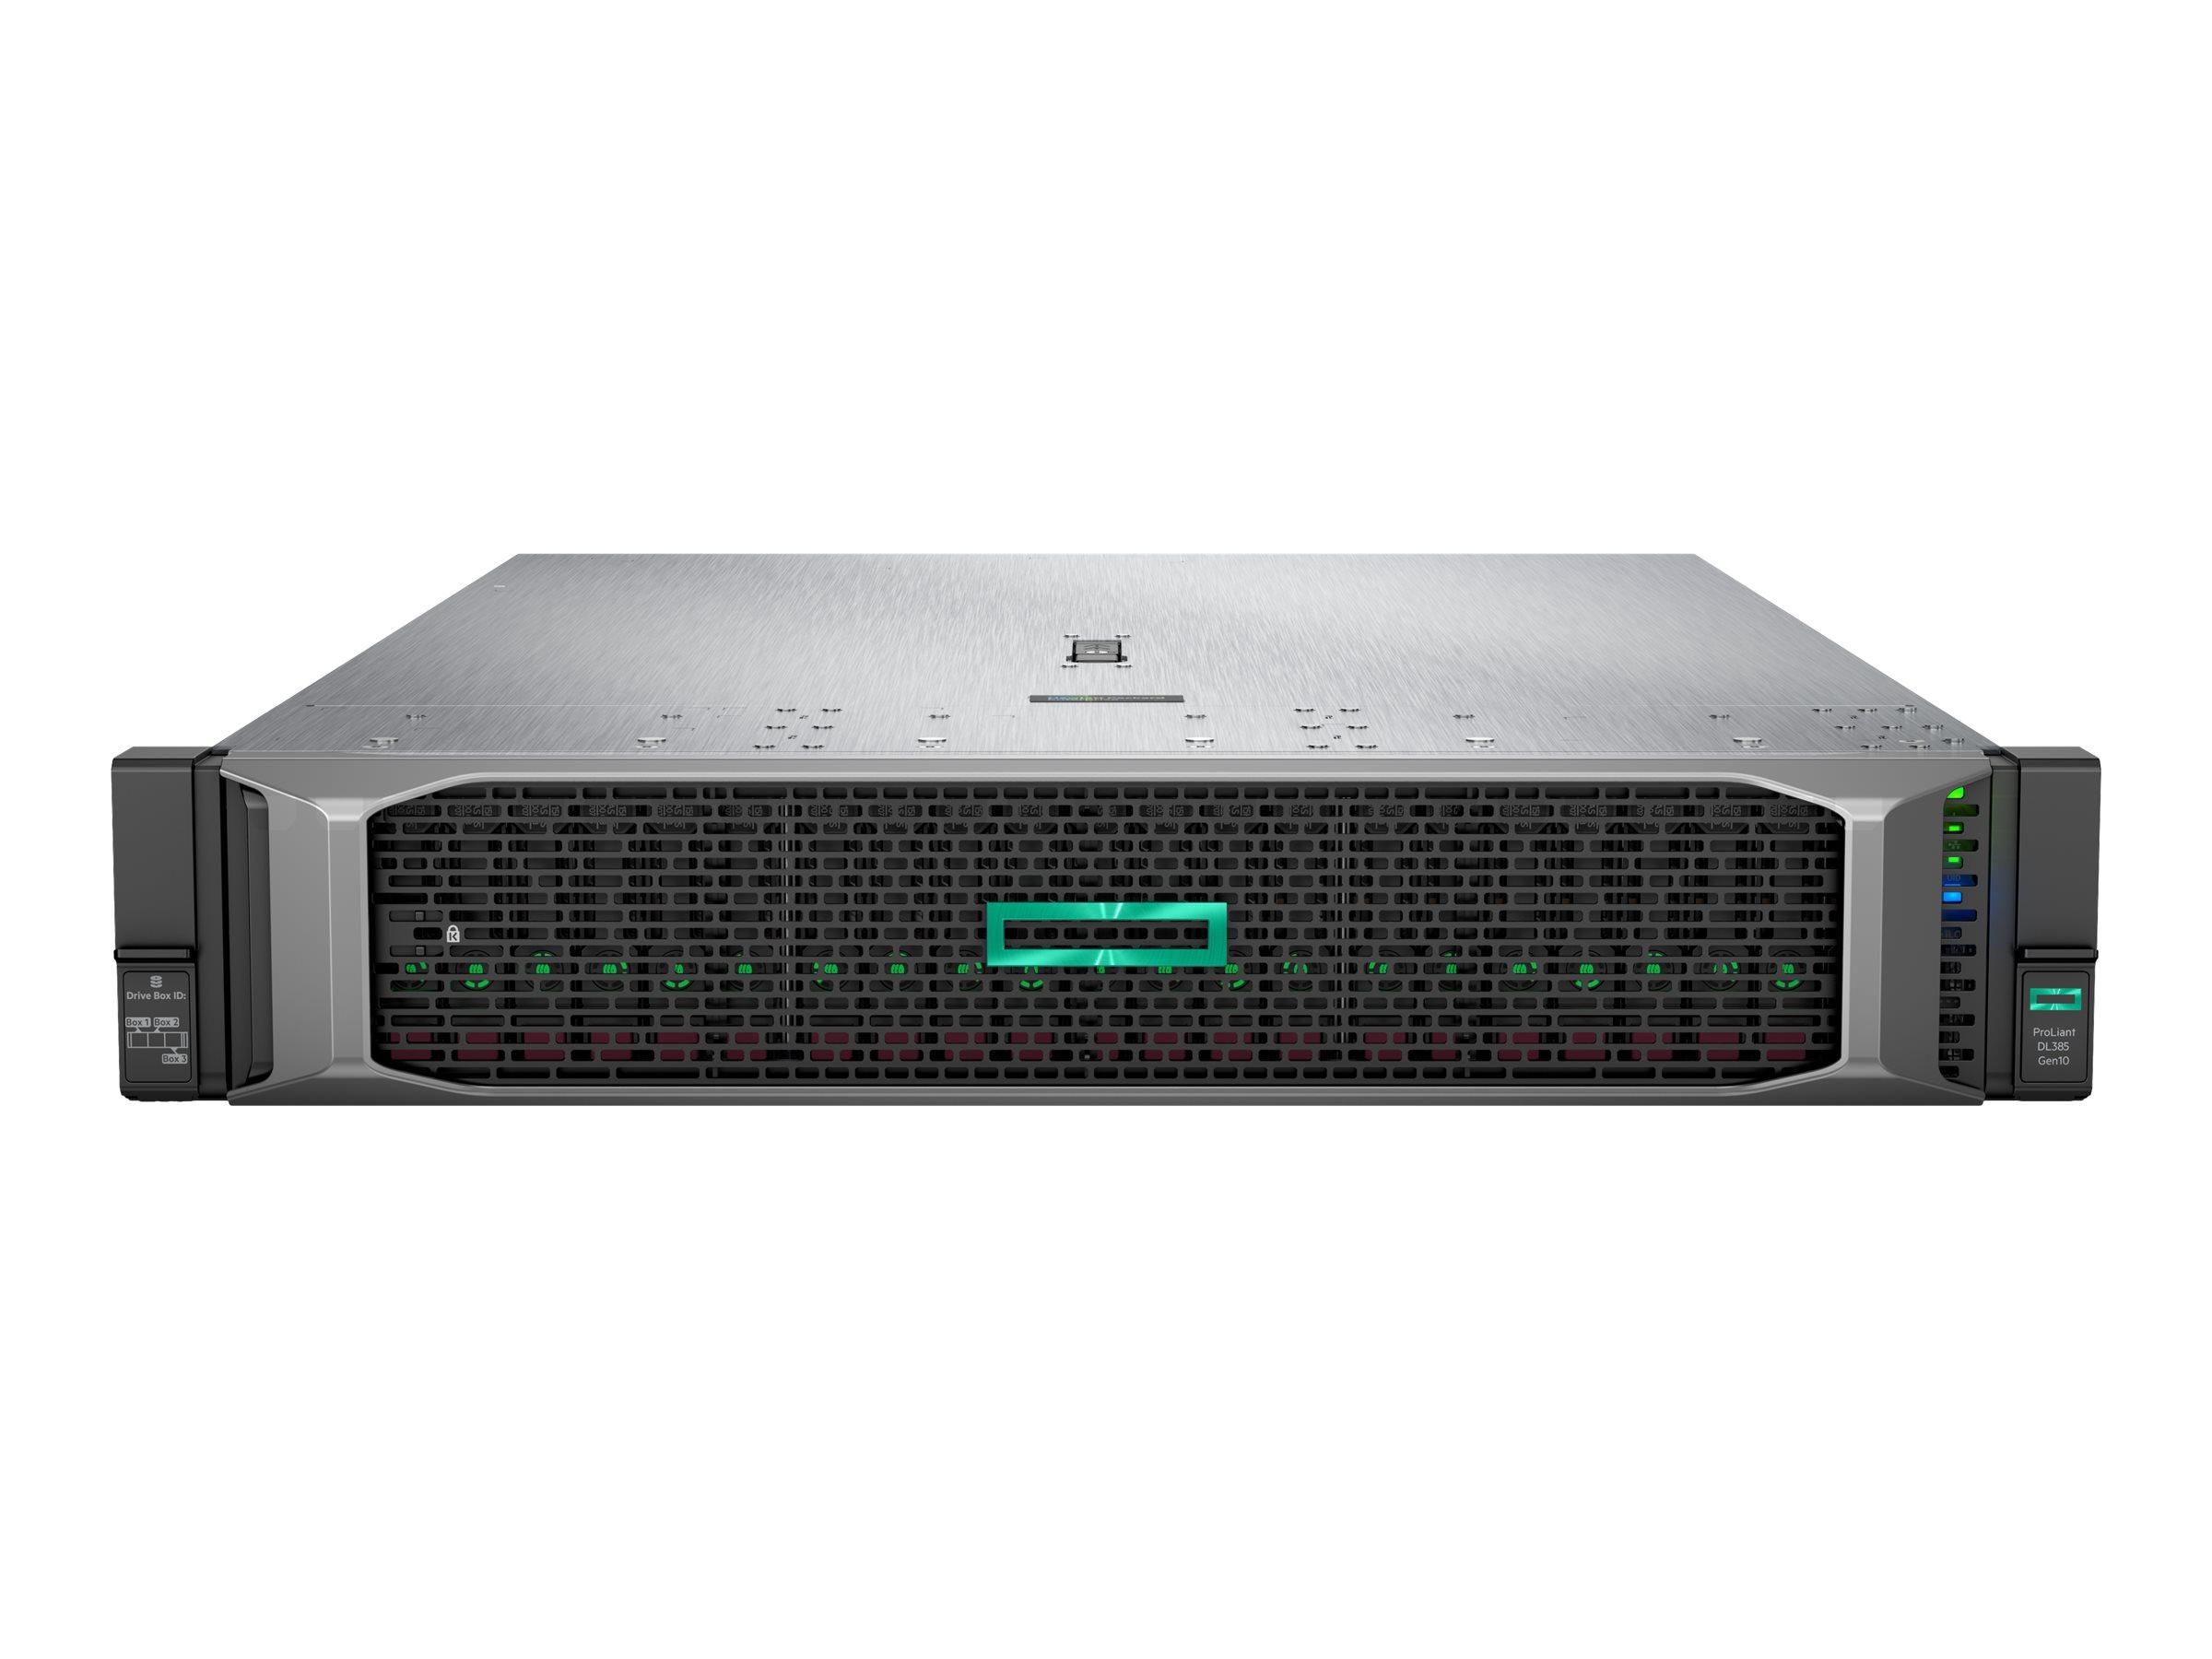 HPE ProLiant DL385 Gen10 Rack Server 1